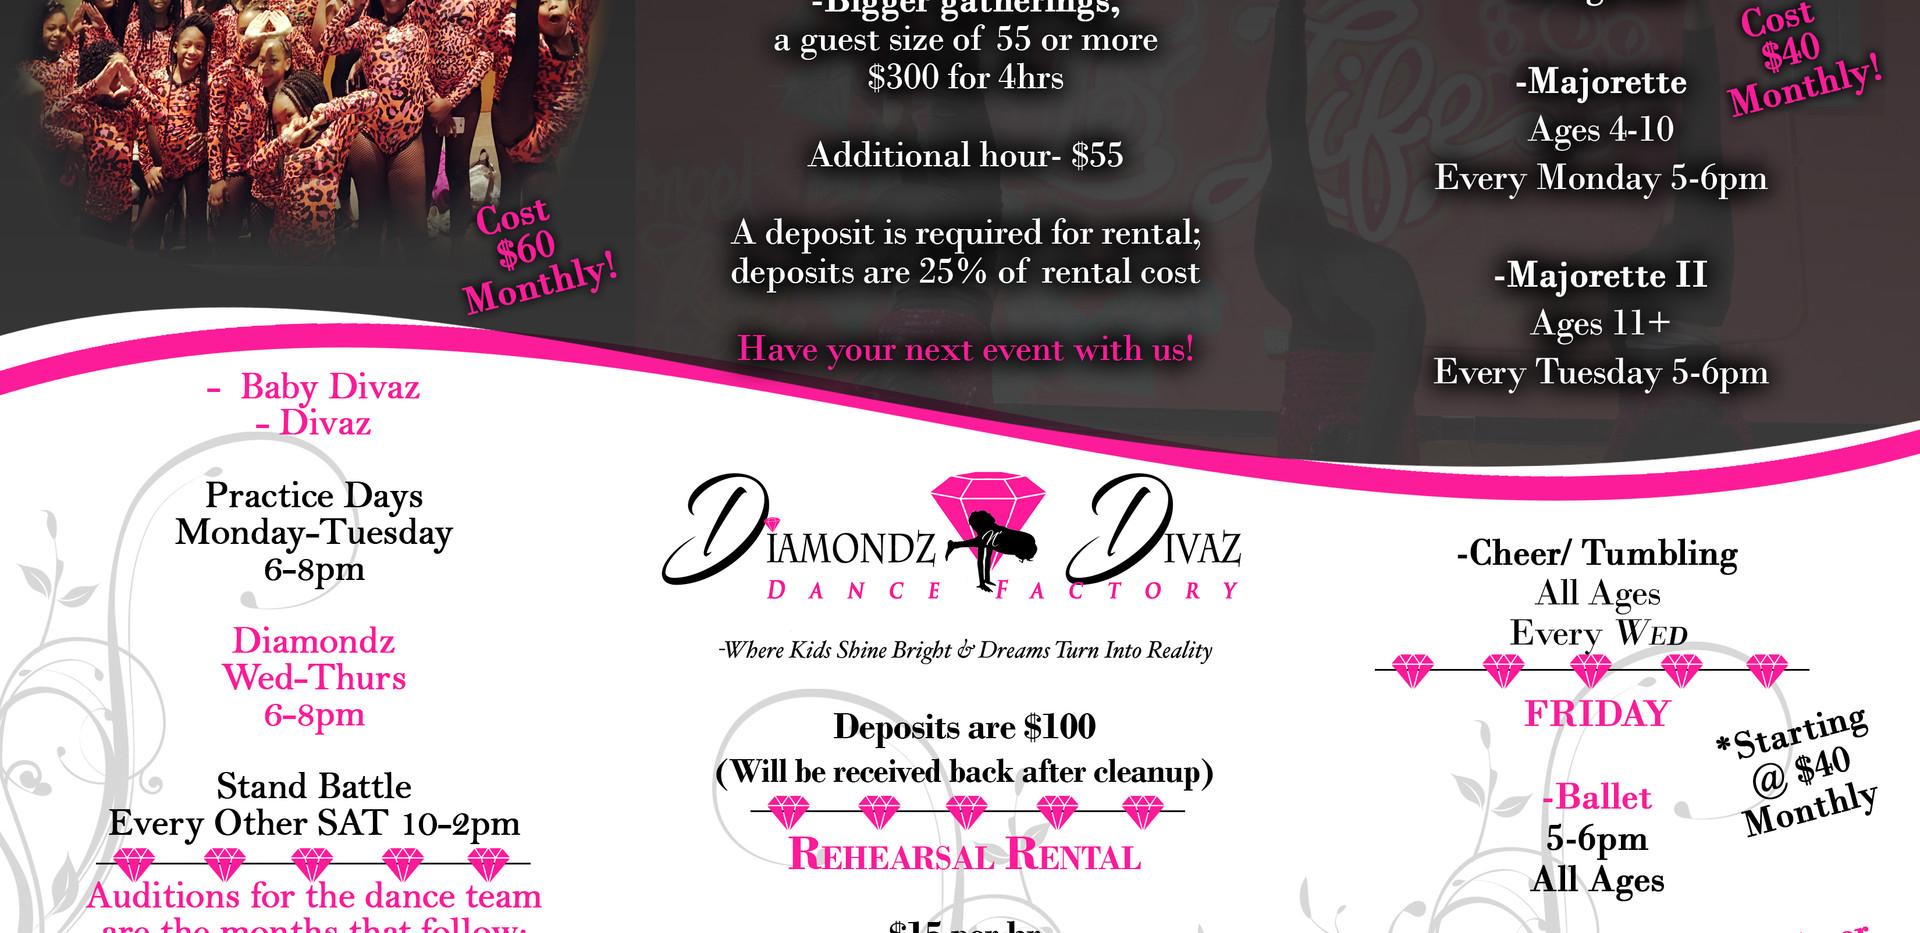 diamondz and divaz brochure inside.jpg